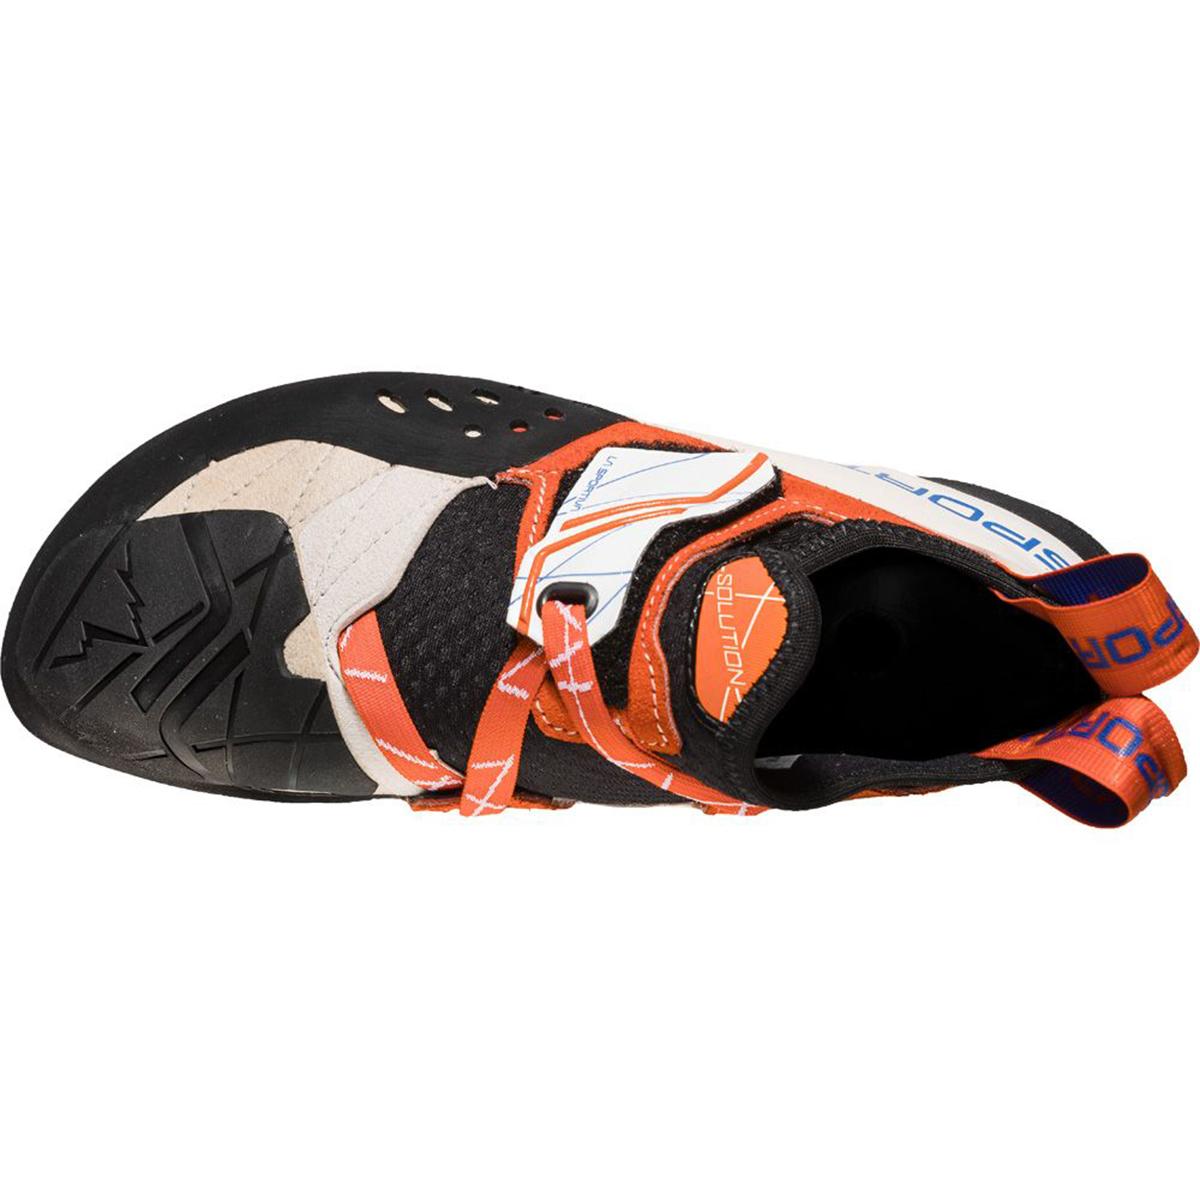 La Sportiva Solution Climbing Shoe Women